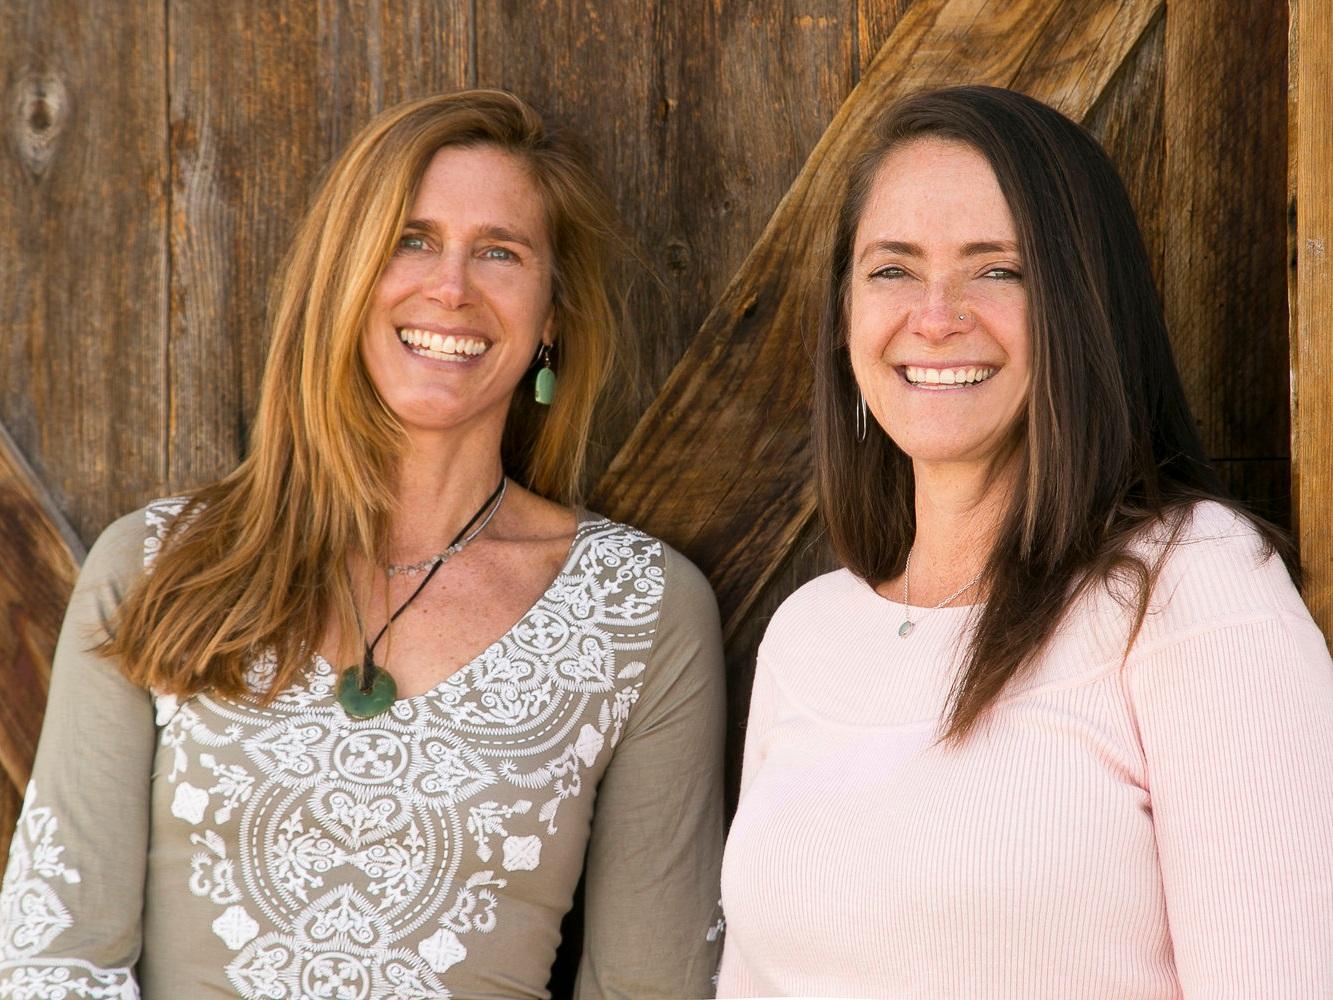 Elizabeth Smith and Karen Hoskin, founders of Zoetica